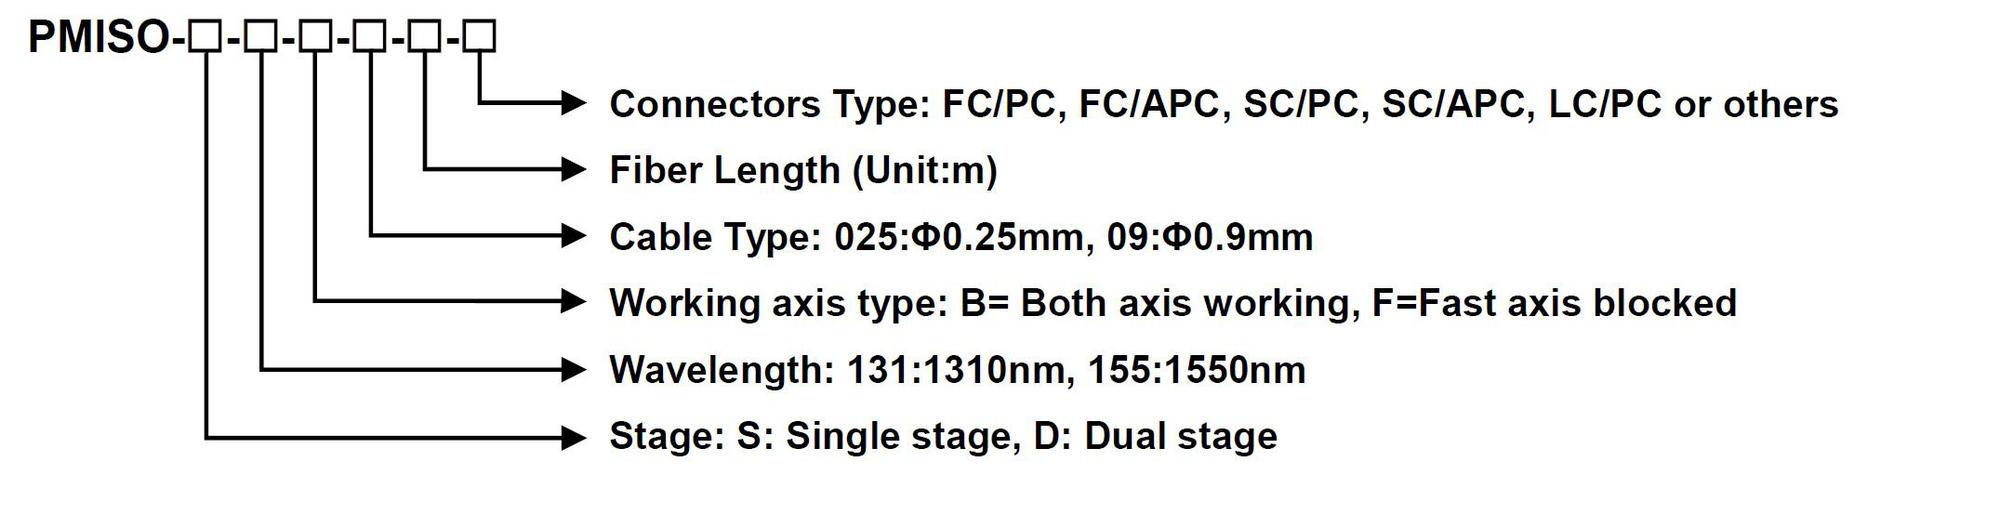 1.4.4 Polarization Maintaining Isolator